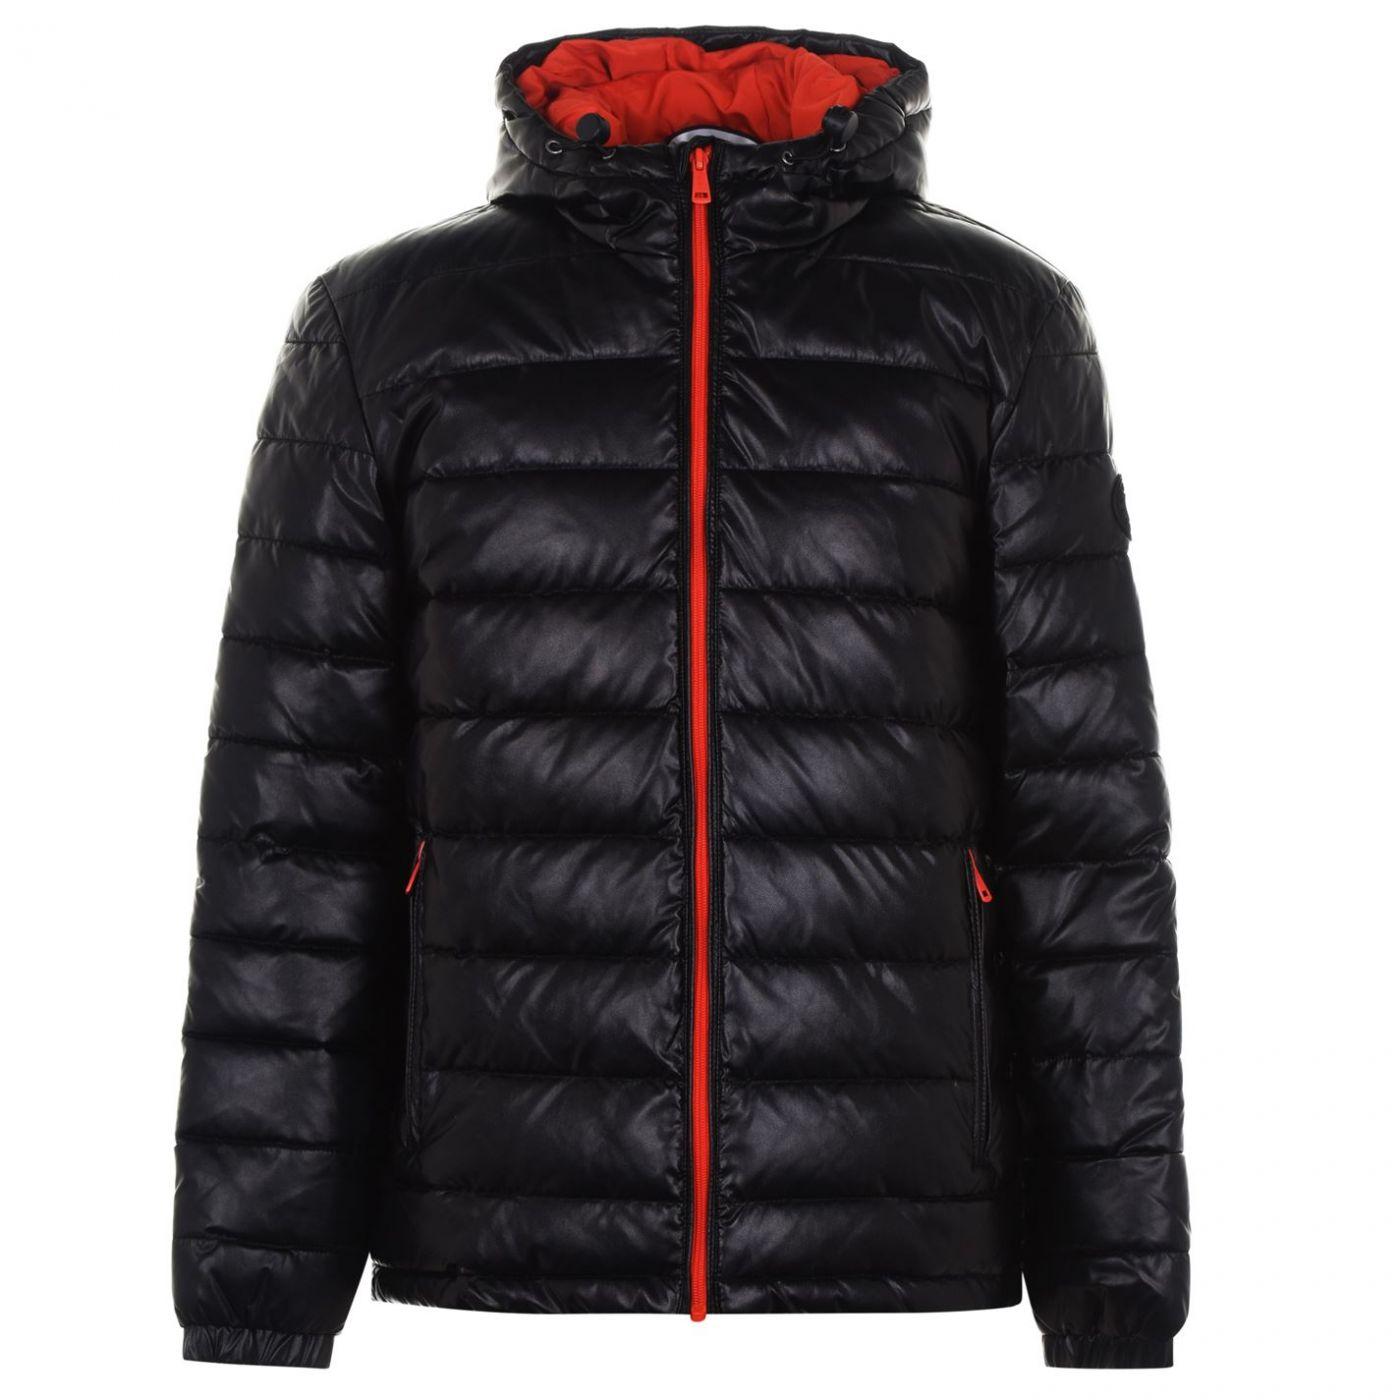 Cole Haan PU Jacket Mens